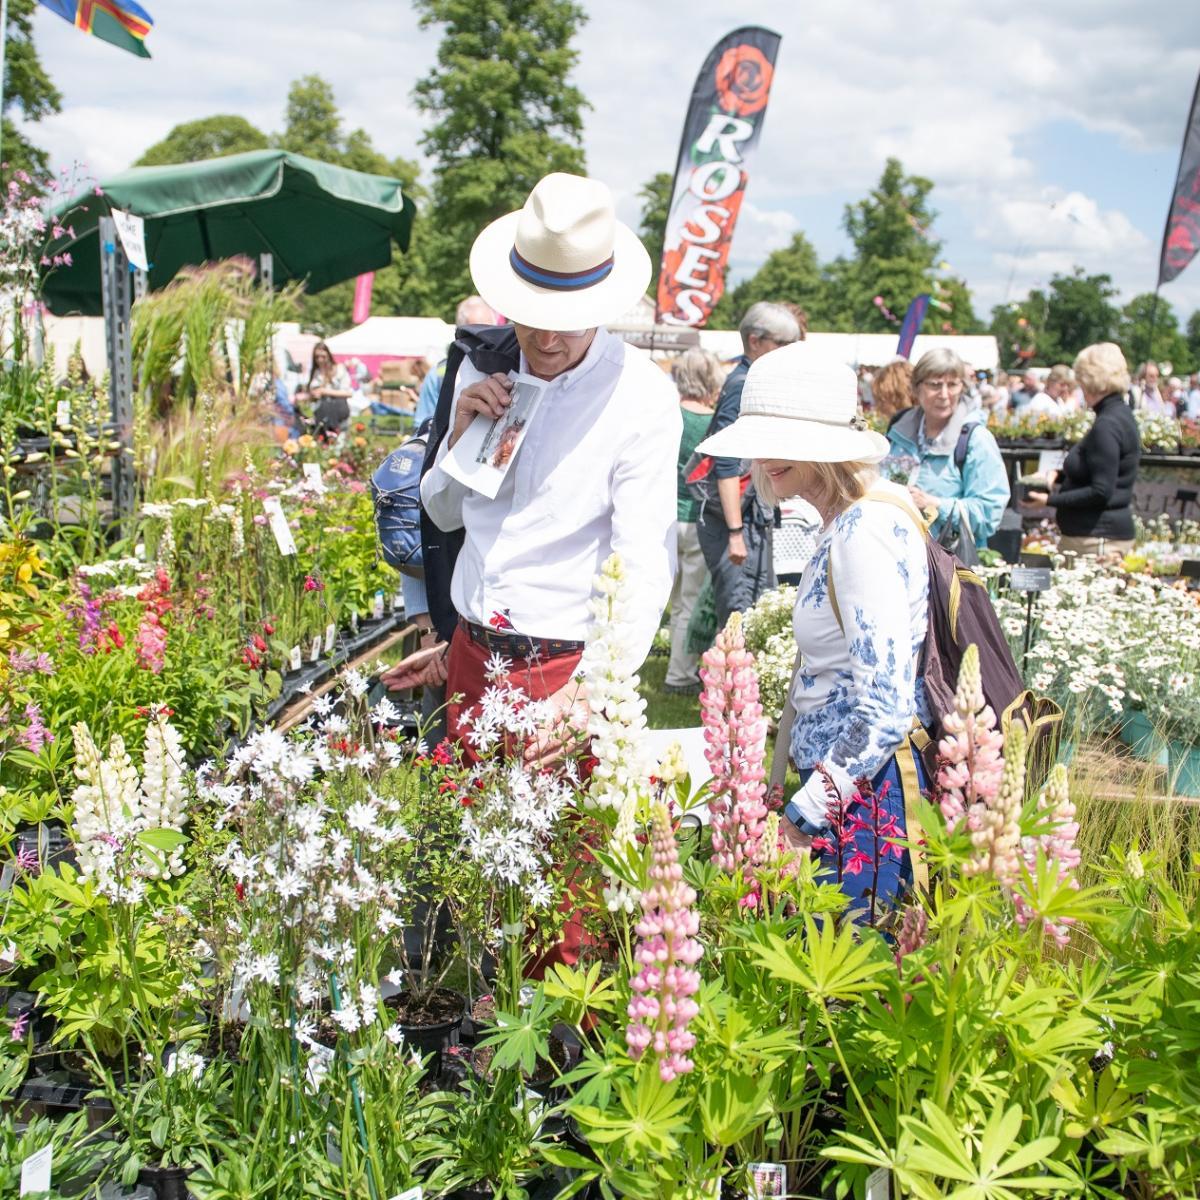 Blenheim Palace Flower Show - Fri 25th June 2021